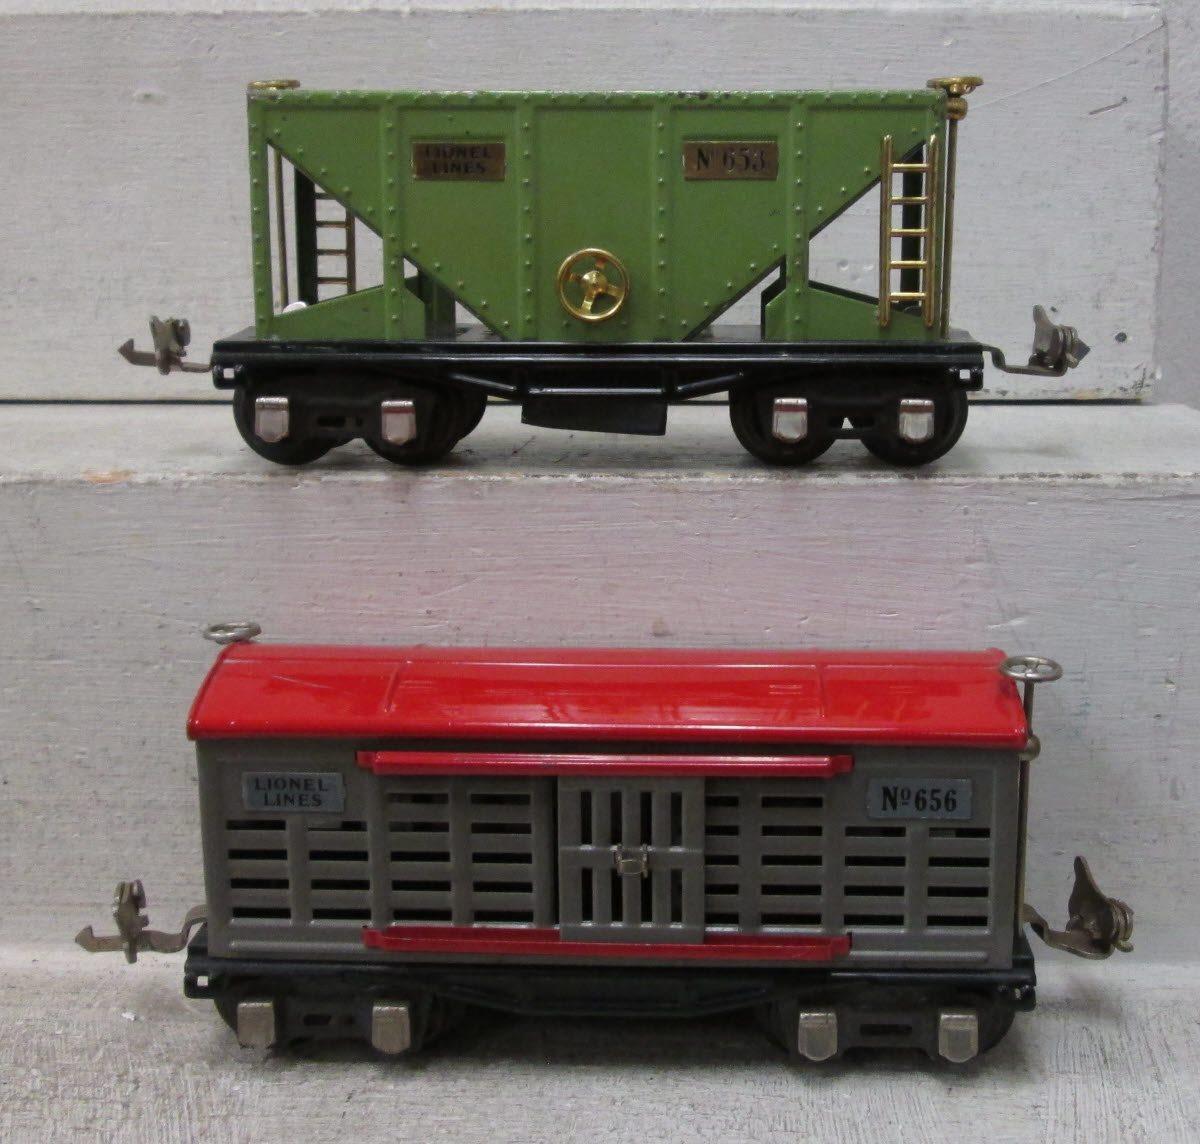 Lionel O Gauge Prewar Freight Cars: 653, 652, 655, 654